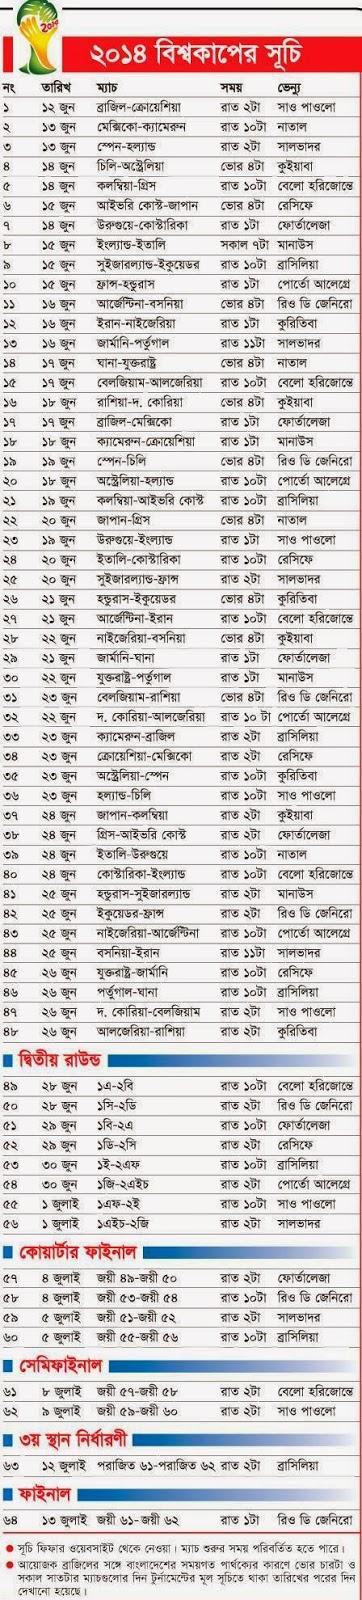 FIFA 2014 World Cup Fixtures bangladesh bd bangla nutboltu